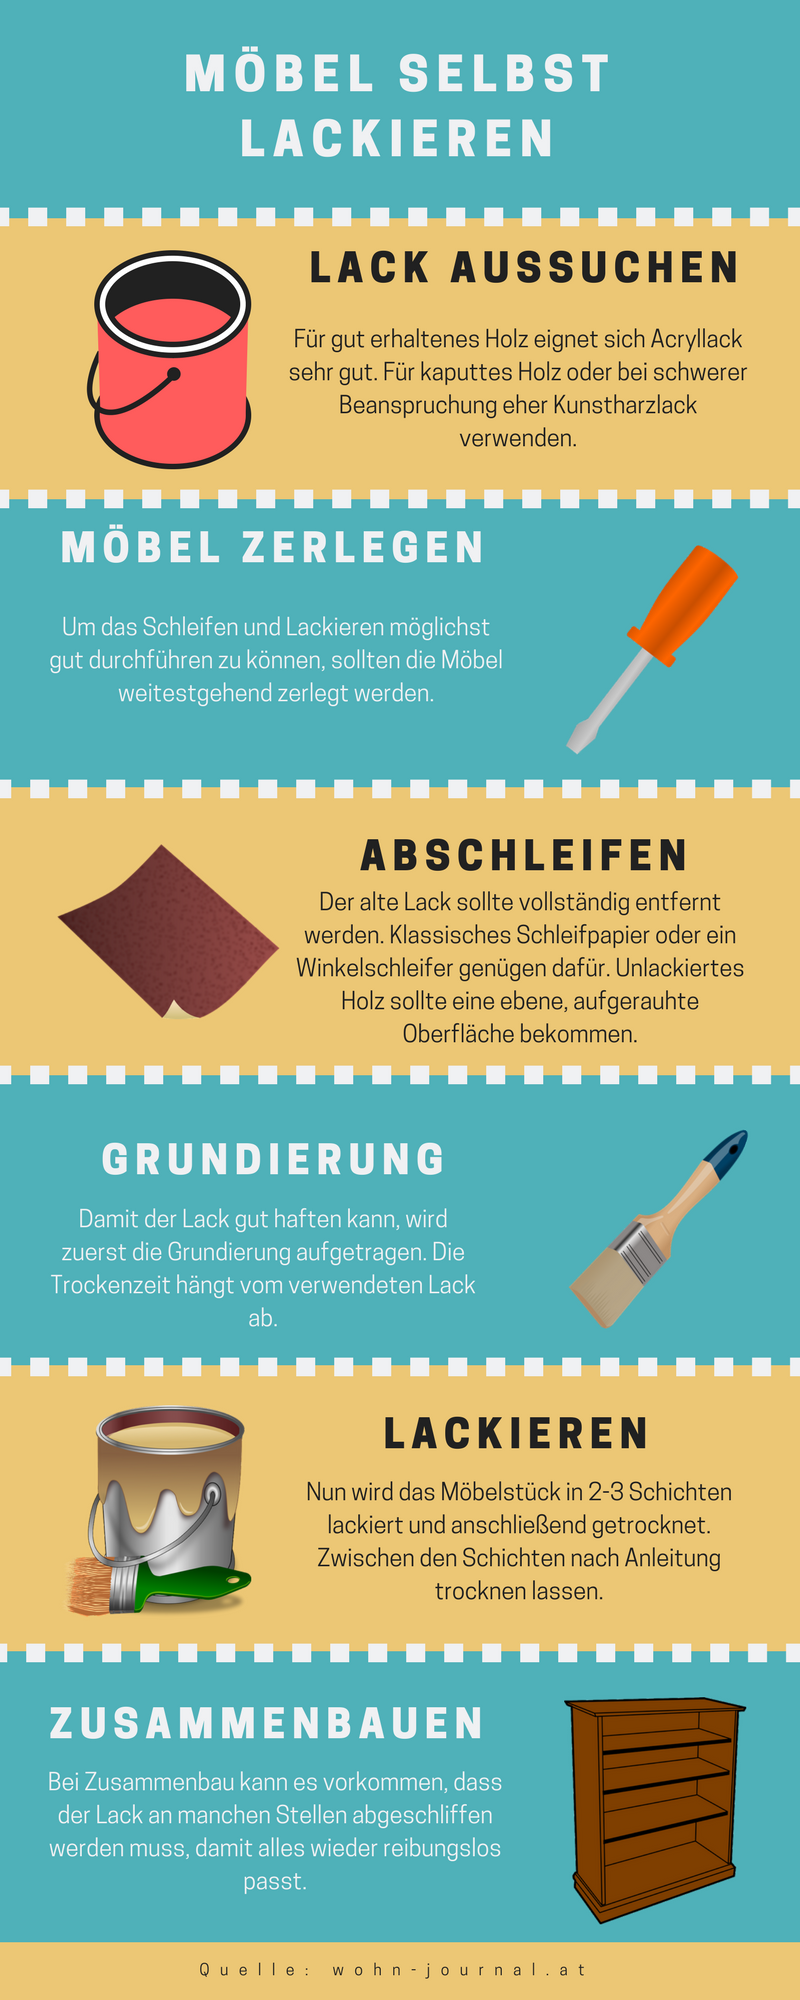 Möbel selbst lackieren Infografik